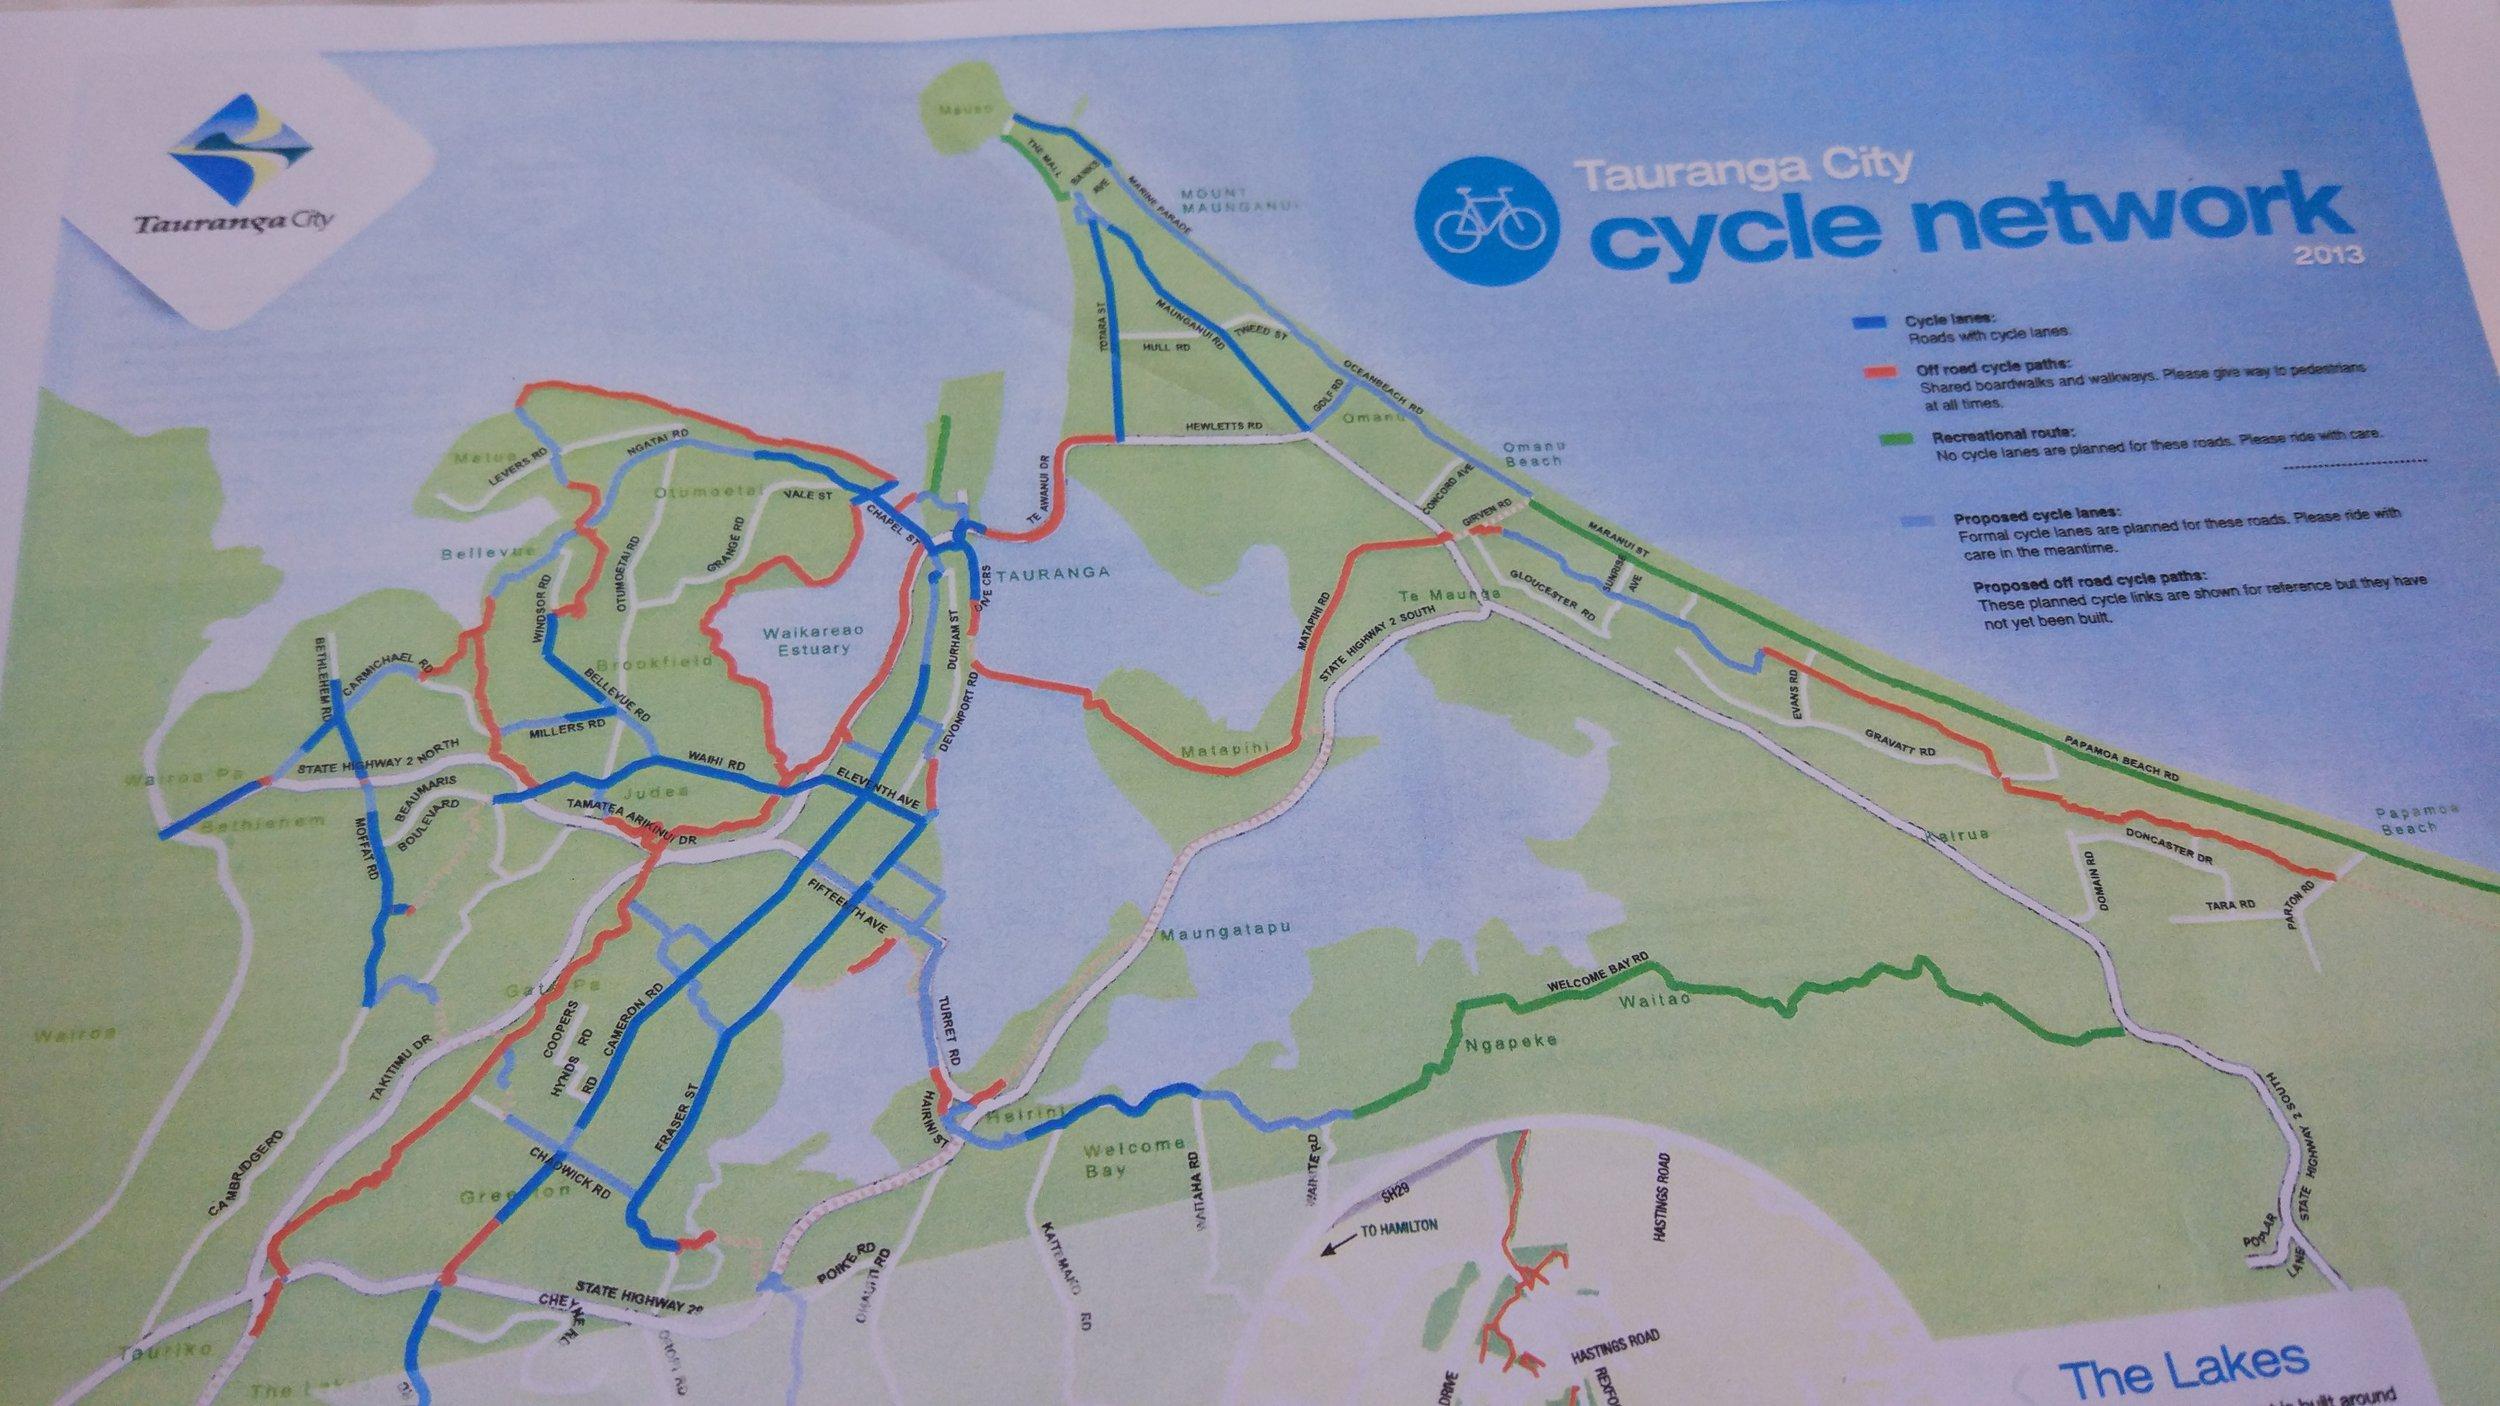 Tauranga Cycling map